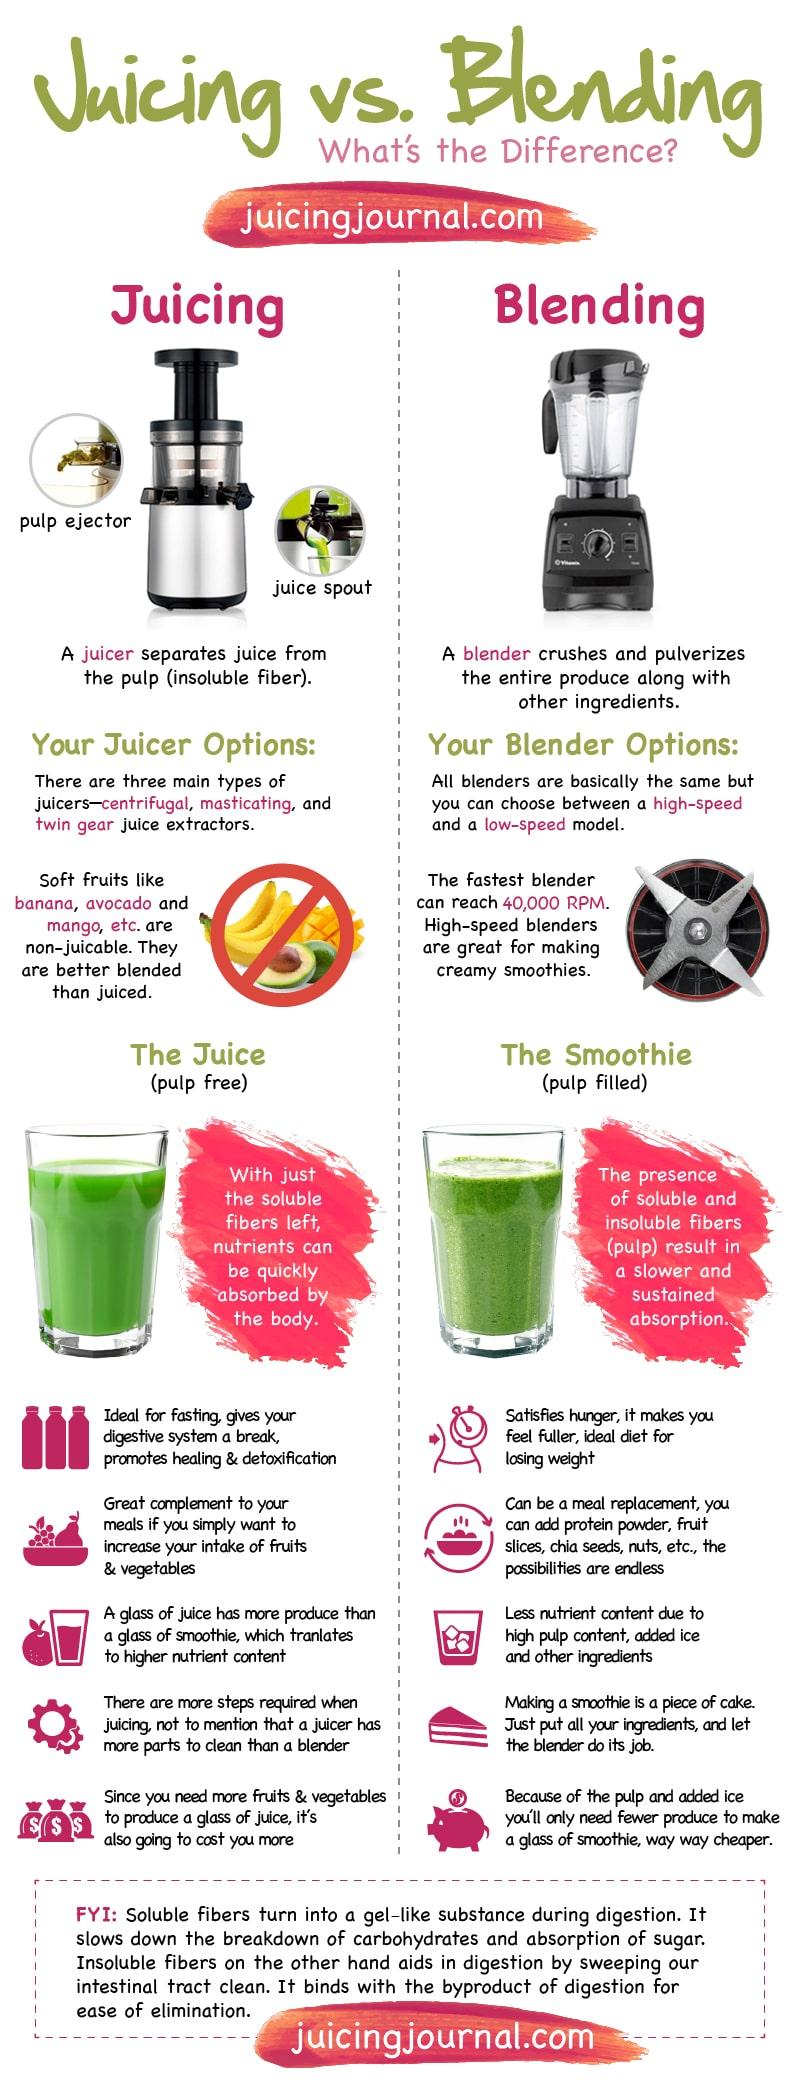 juicing vs blending [infographic] « juicing journal